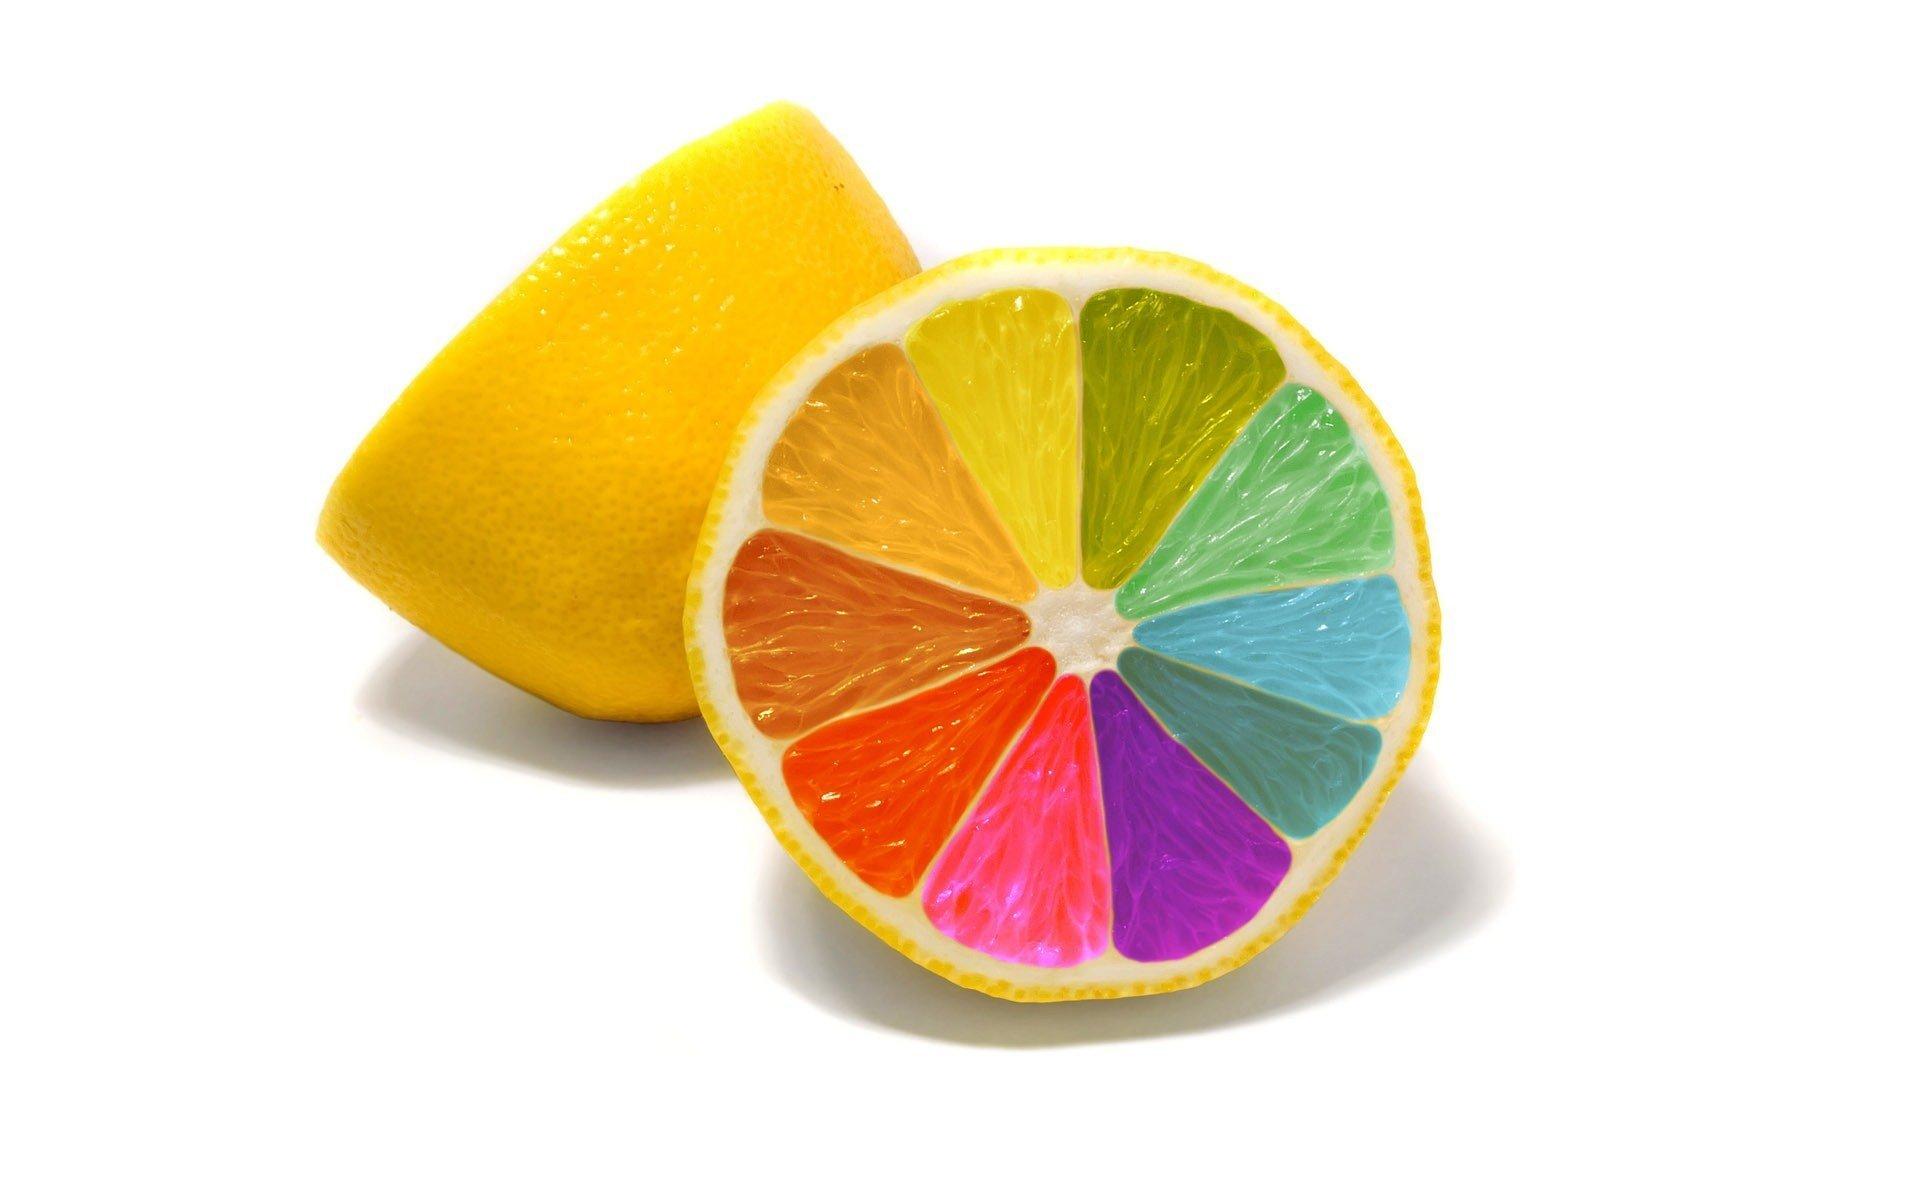 Colorful Food Wallpaper Free Download: Colorful, Food, Simple Background, Minimalism, Lemons HD